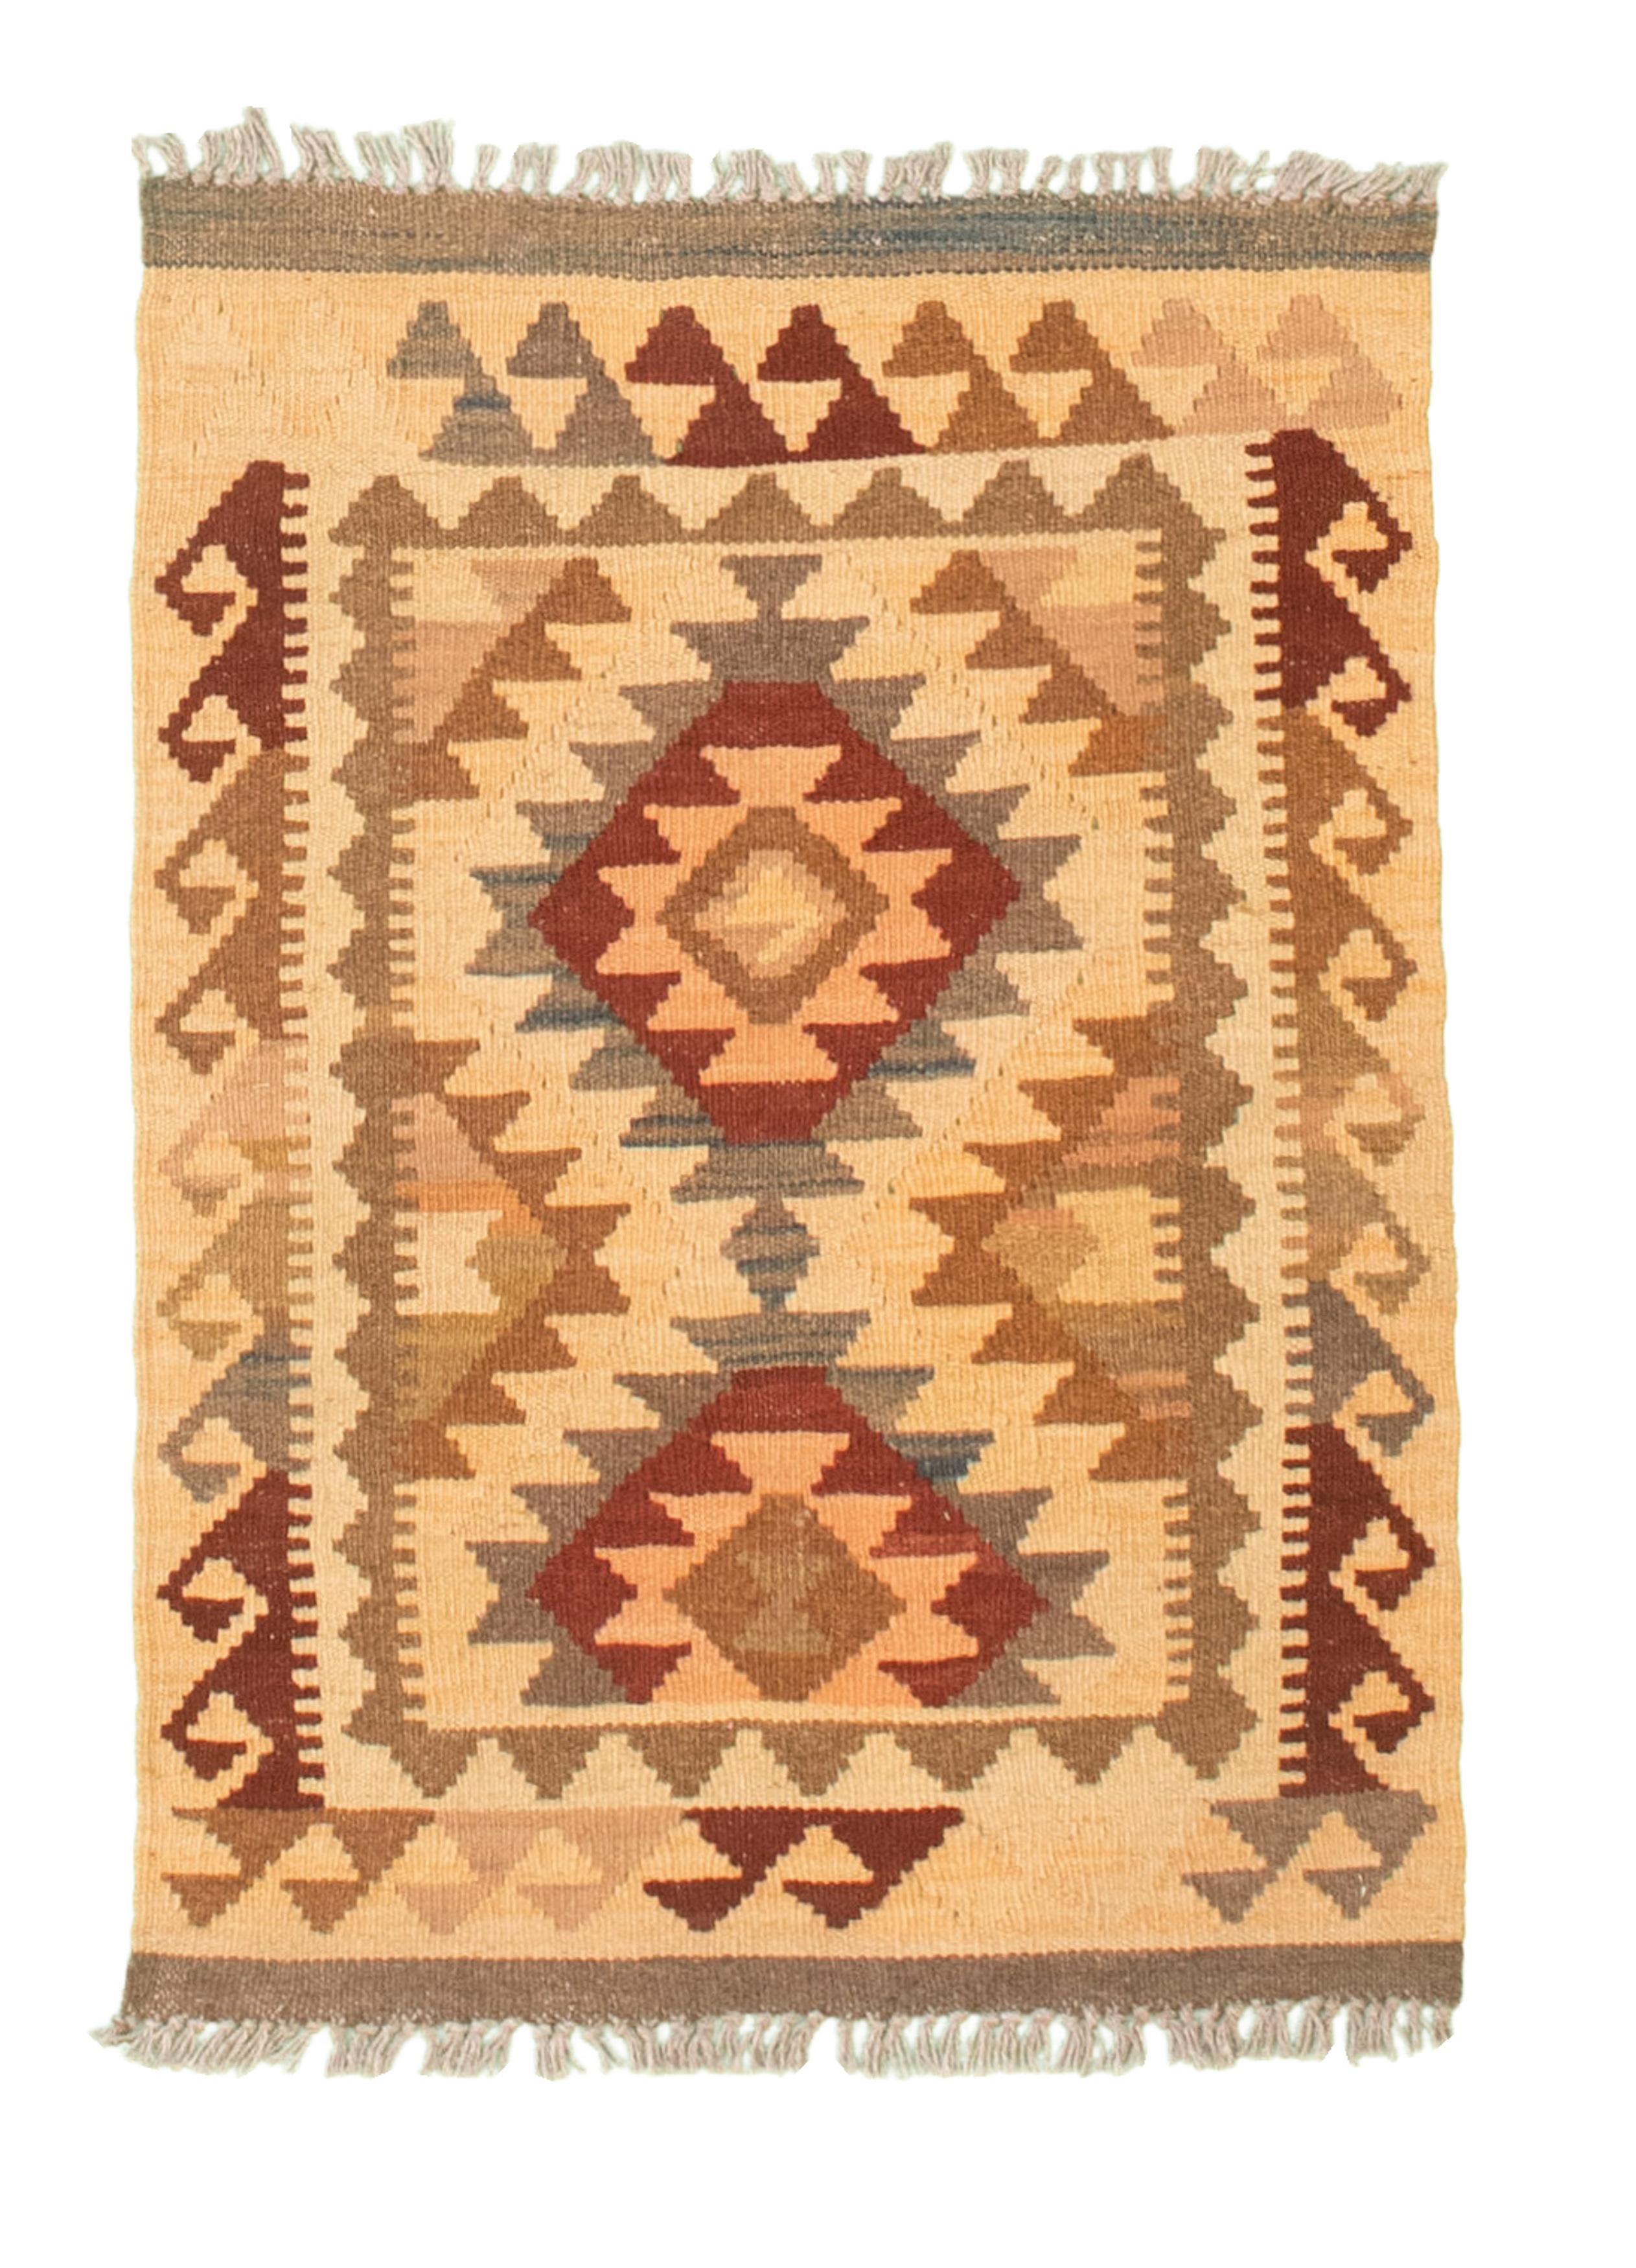 "Hand woven Kashkoli FW Cream Cotton Kilim 2'0"" x 2'9"" Size: 2'0"" x 2'9"""